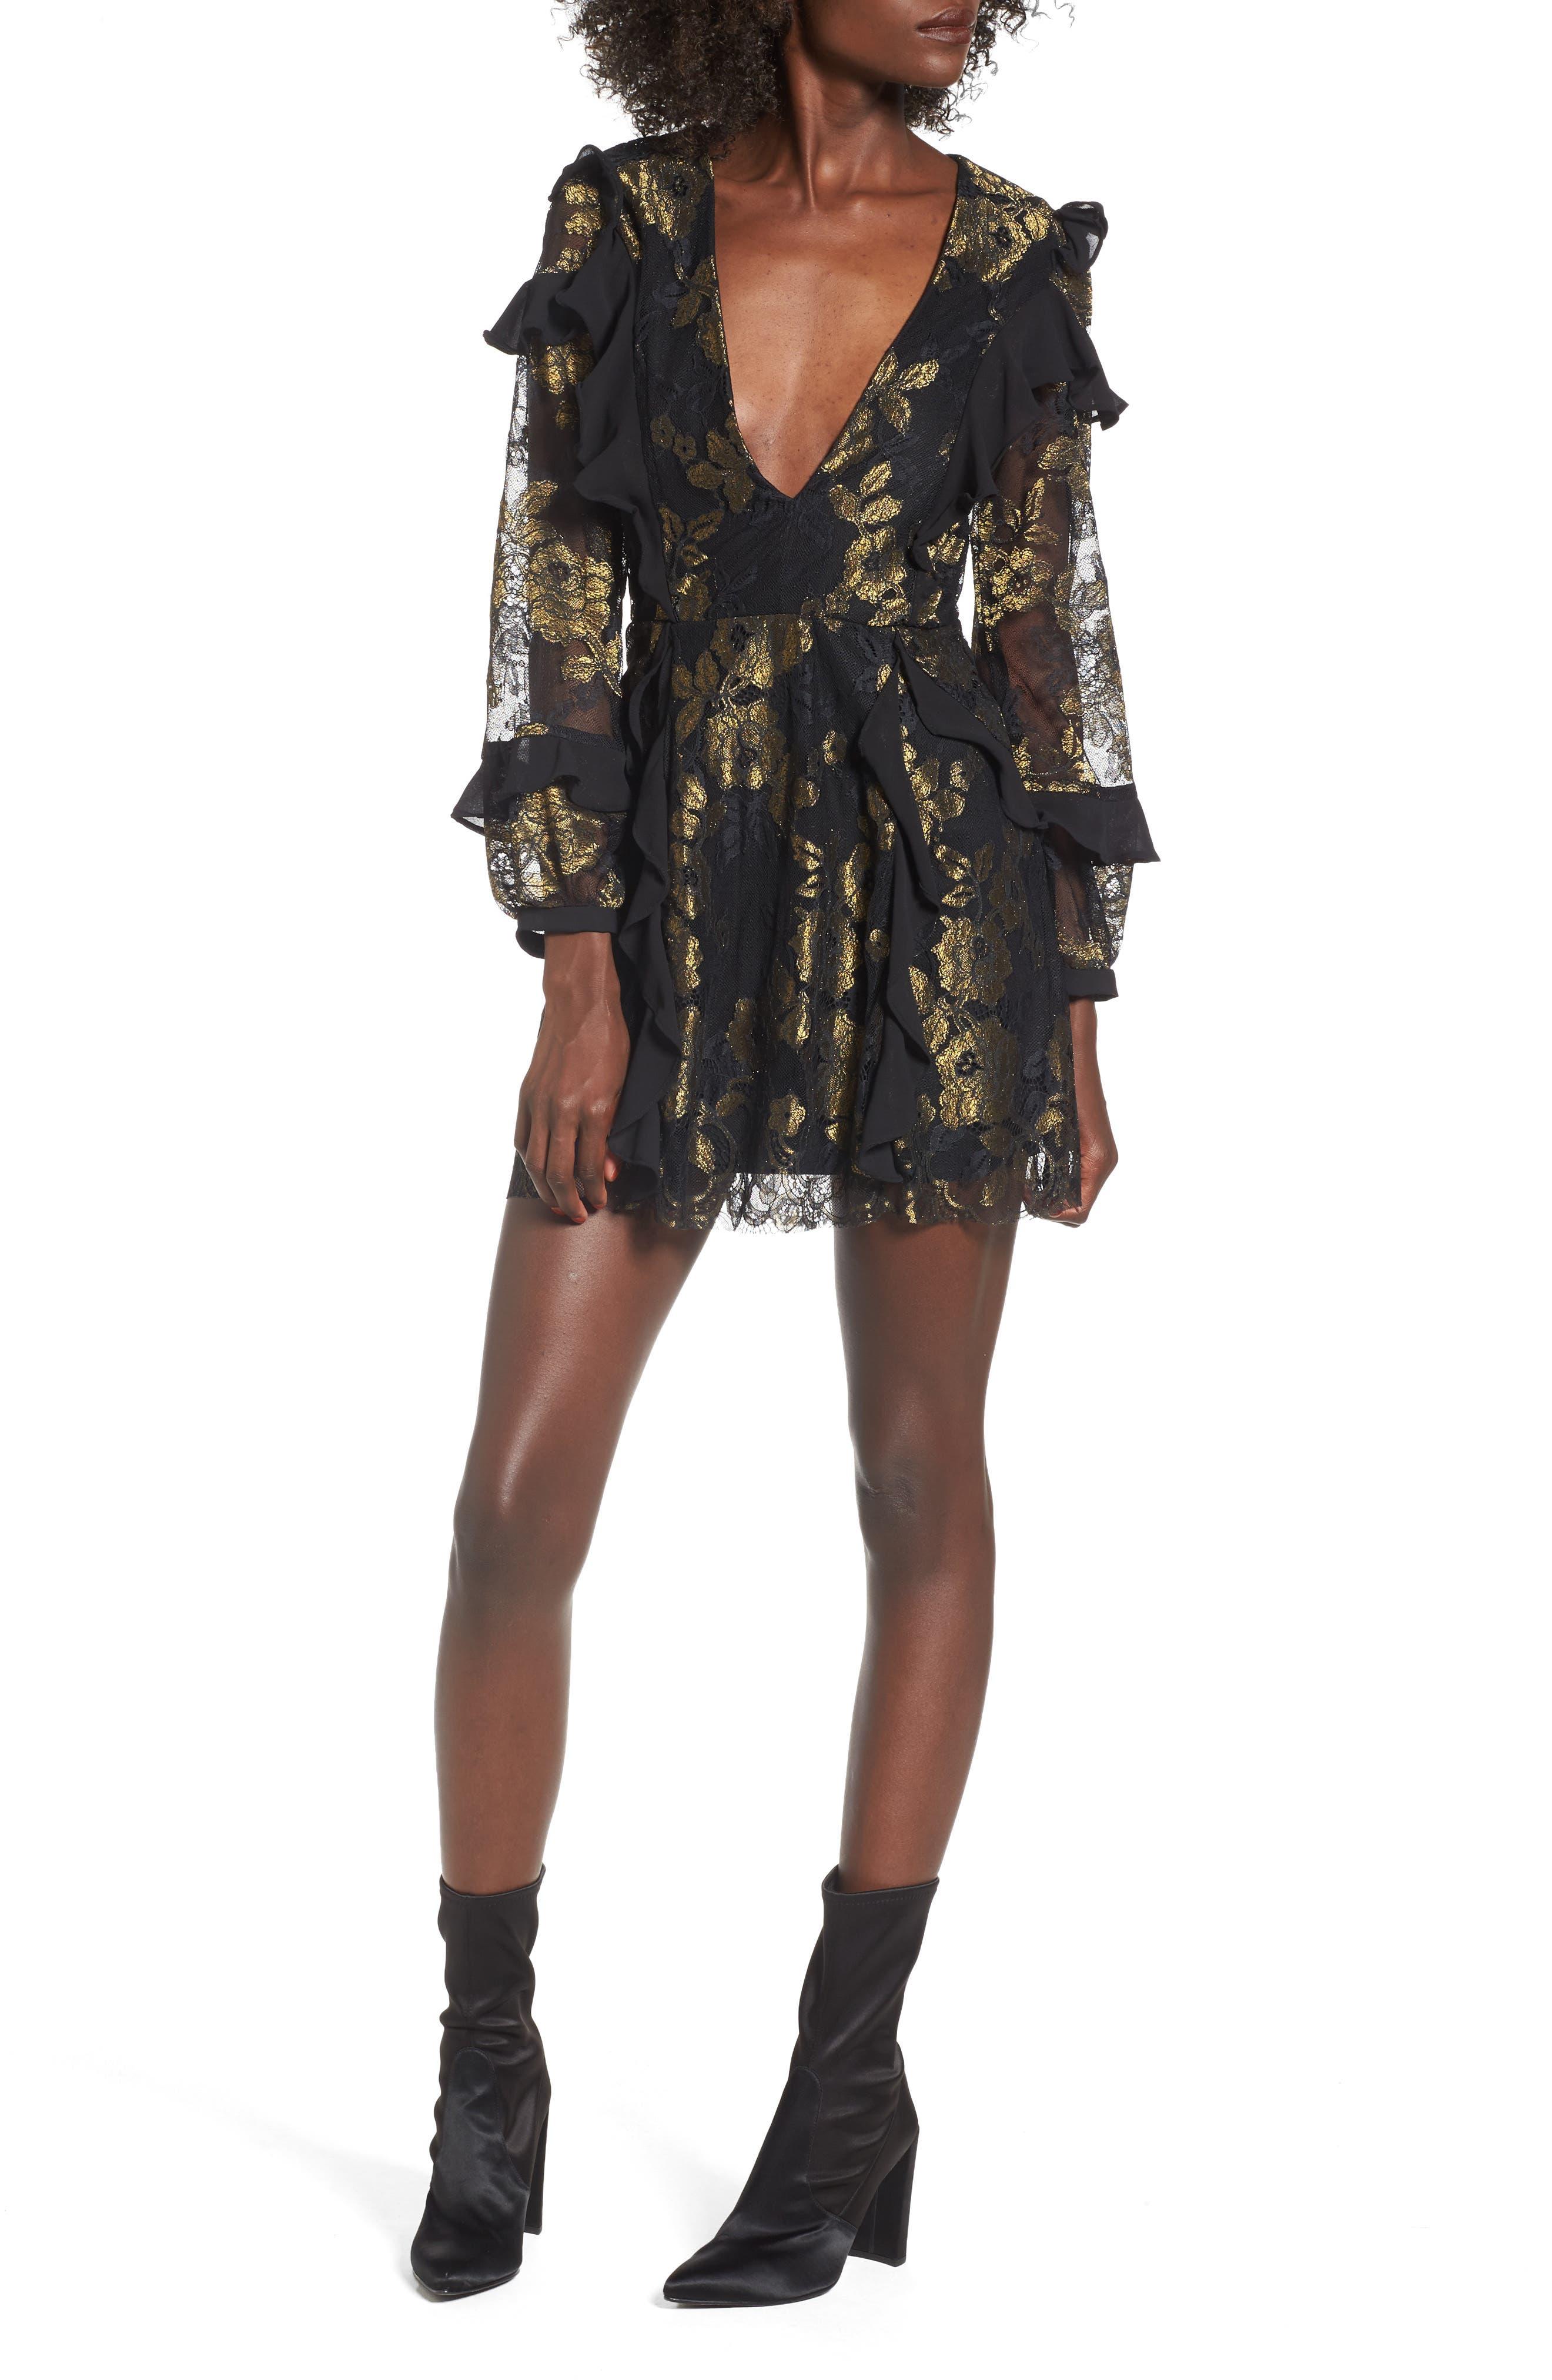 Bumble Minidress,                         Main,                         color, Black Gold